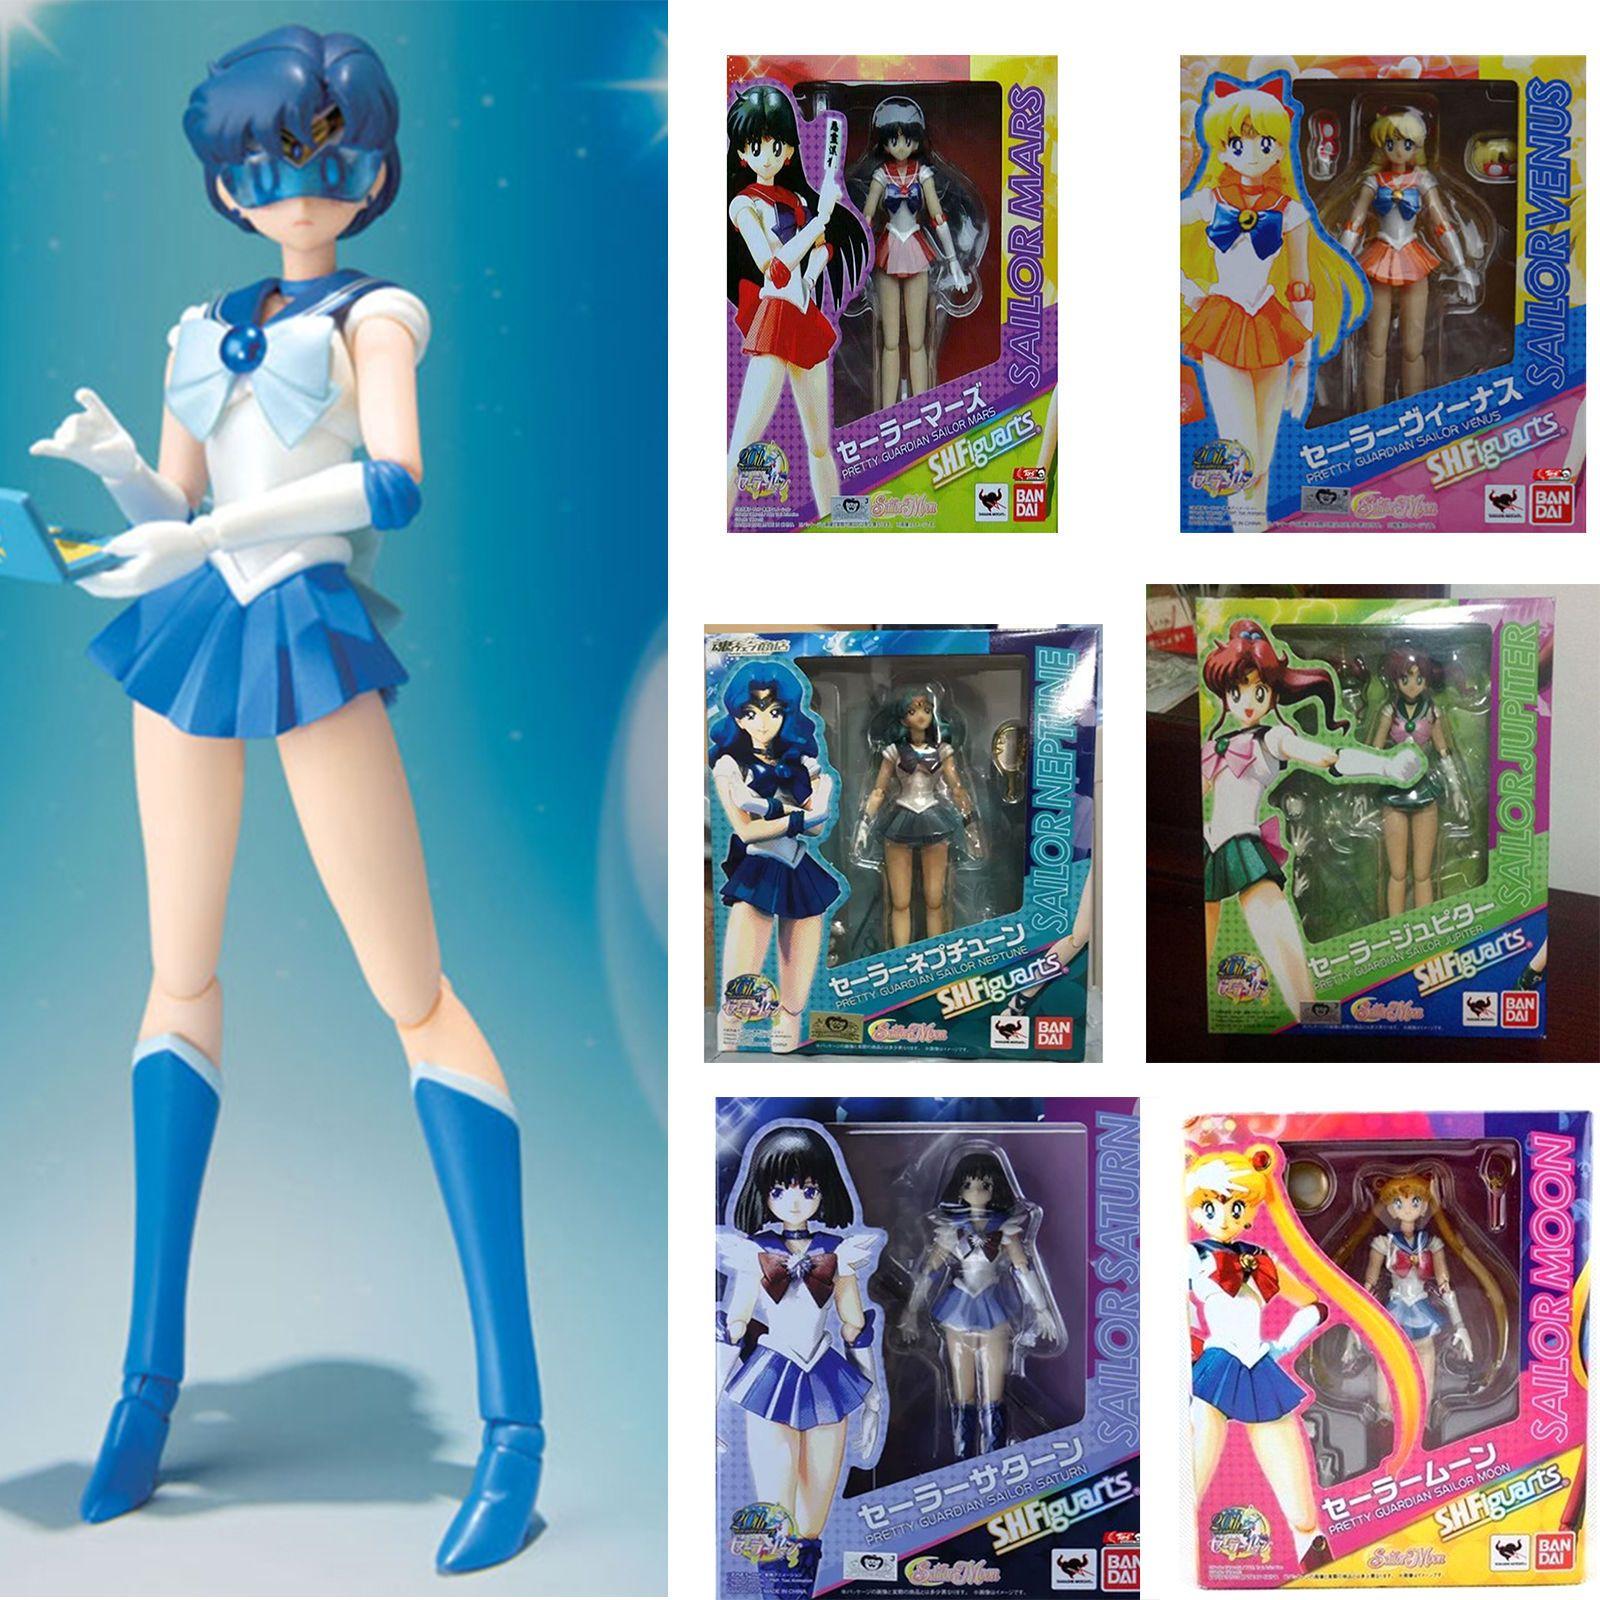 Sailor Moon Pretty Guardian Tsukino Usagi Figure Figma Collect Toys Collection